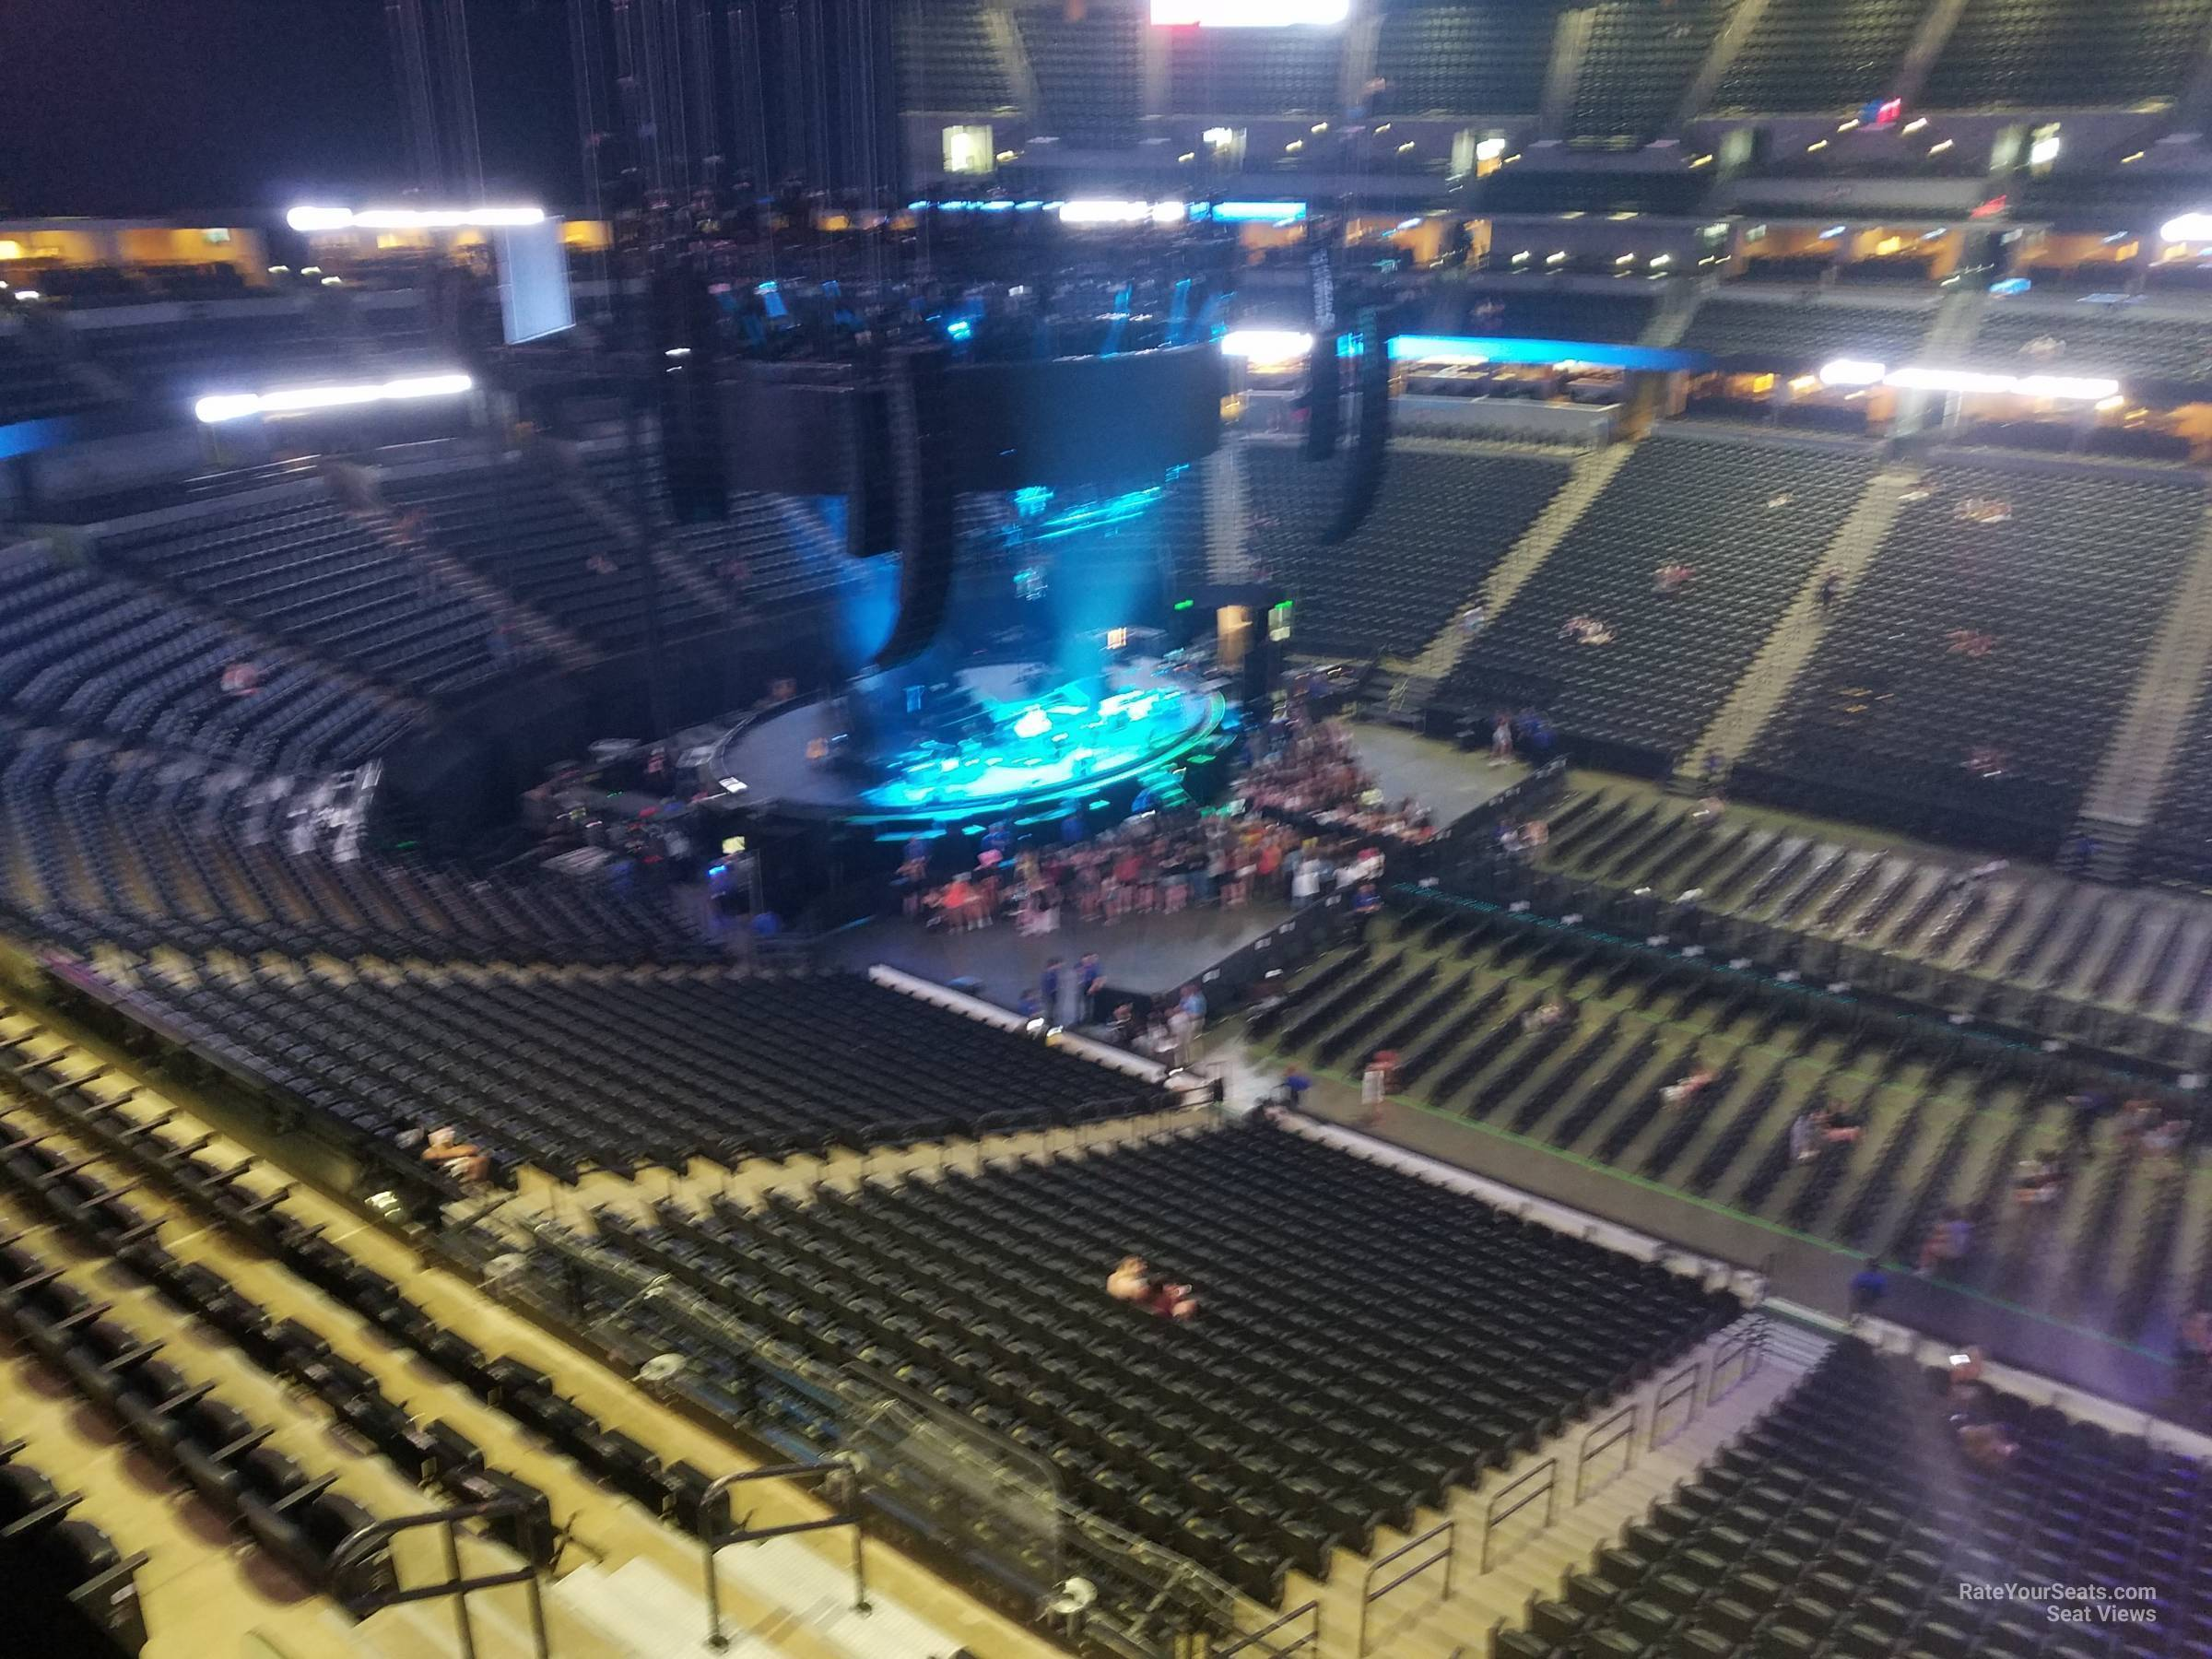 Pepsi Center Section 341 Concert Seating Rateyourseatscom